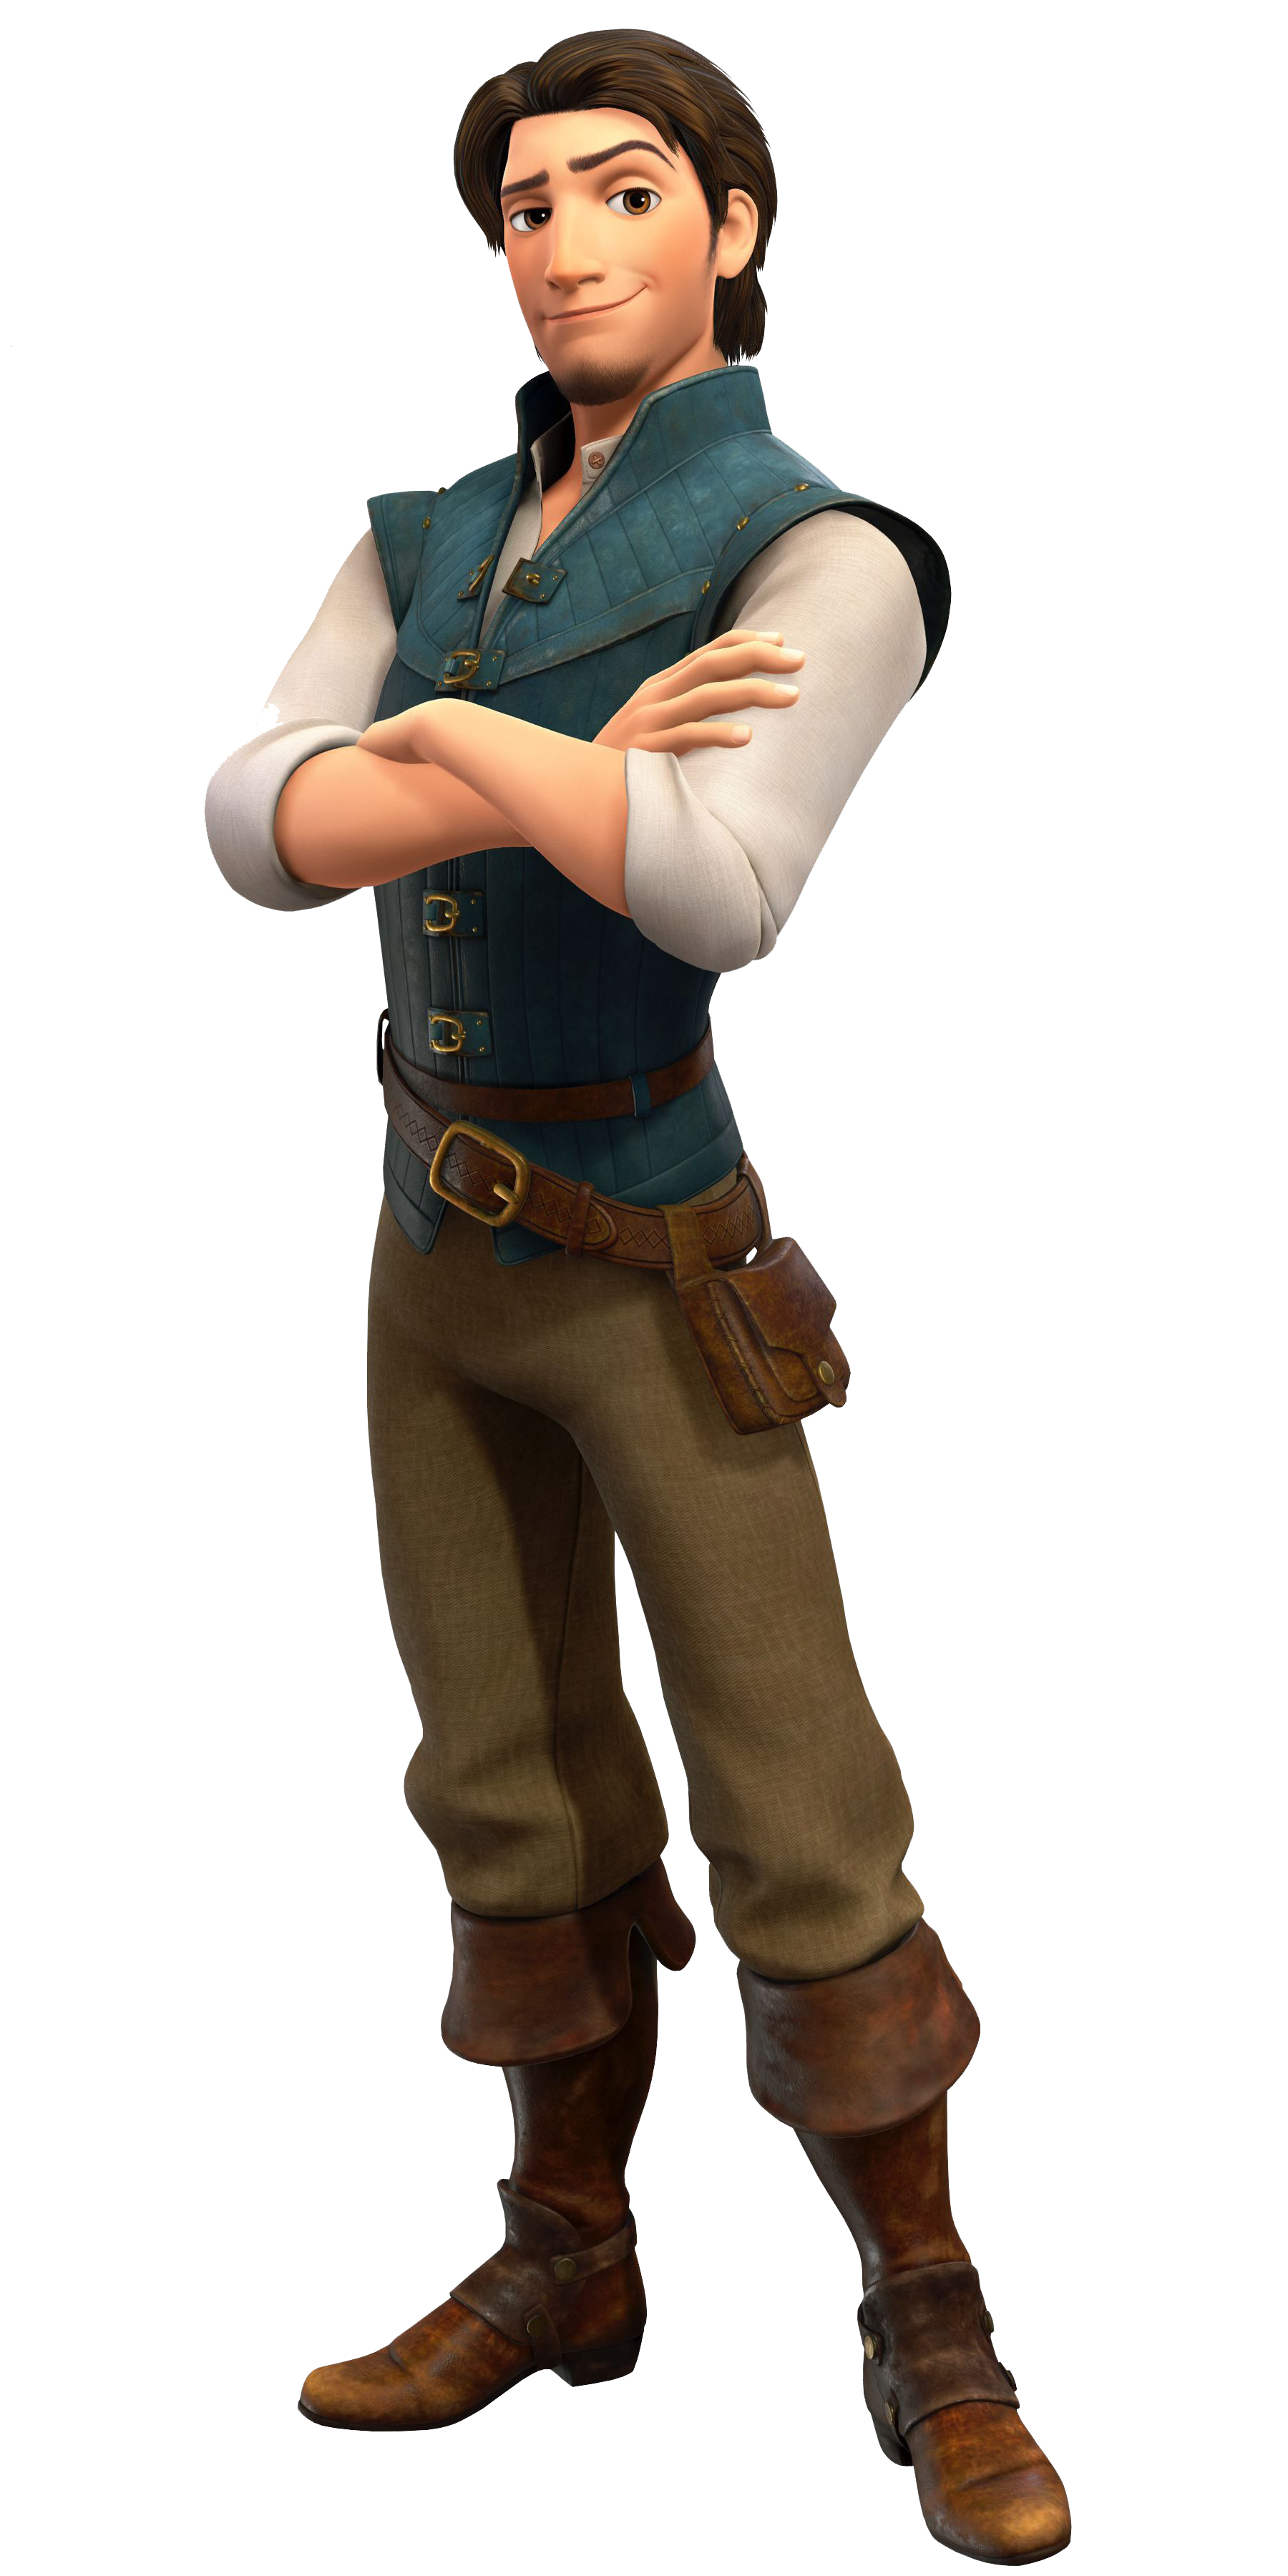 Flynn Rider Download PNG Image.